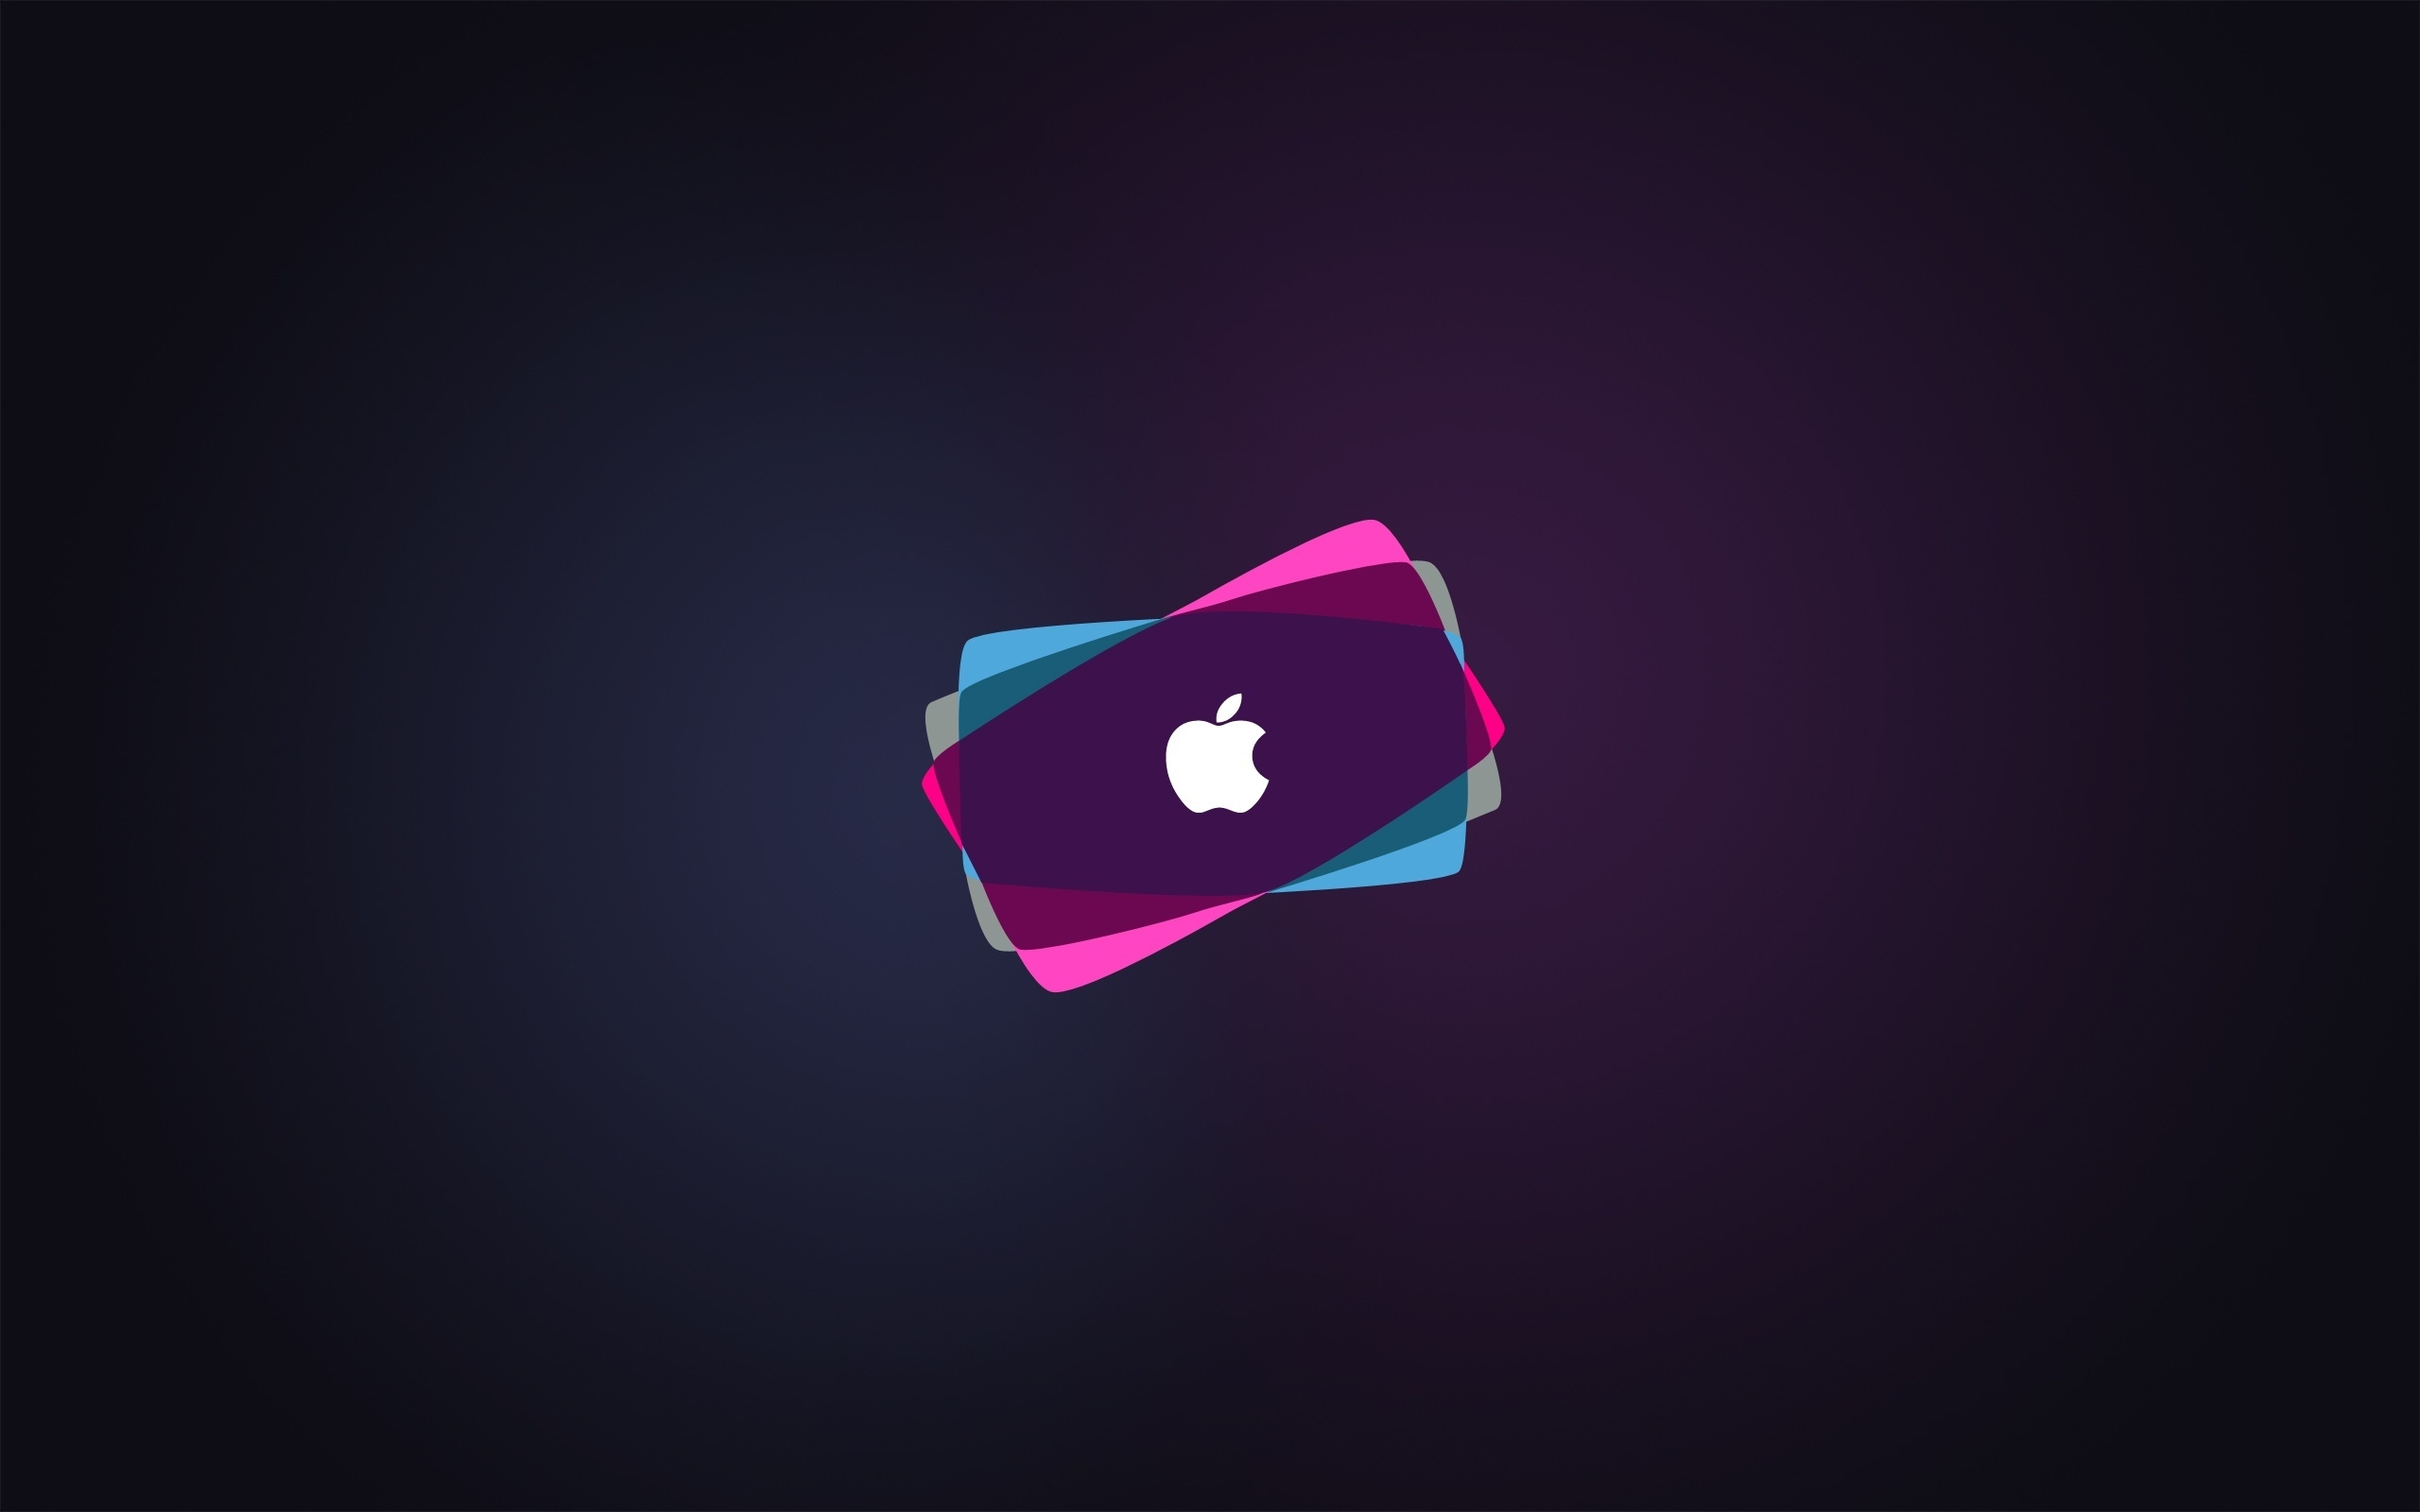 Cool Desktop Backgrounds For Mac